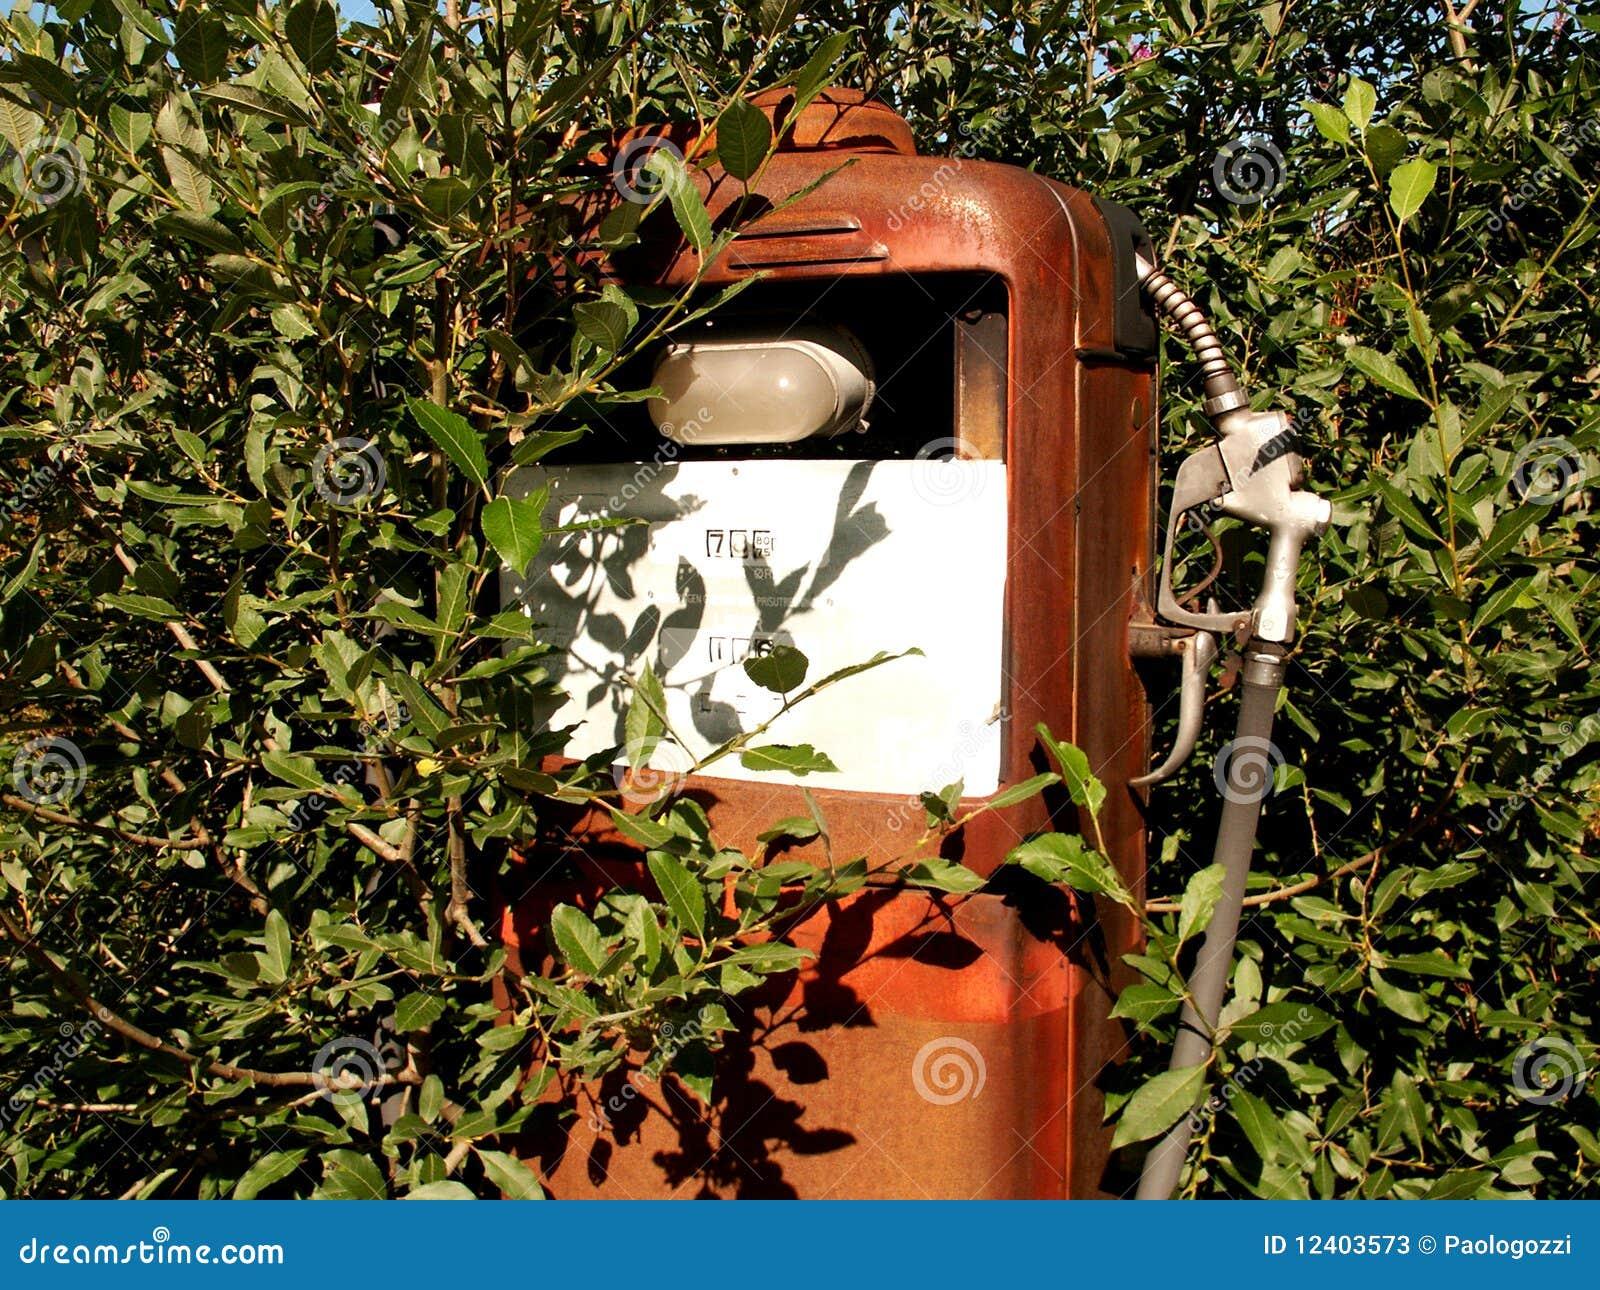 Green gasoline in lofoten